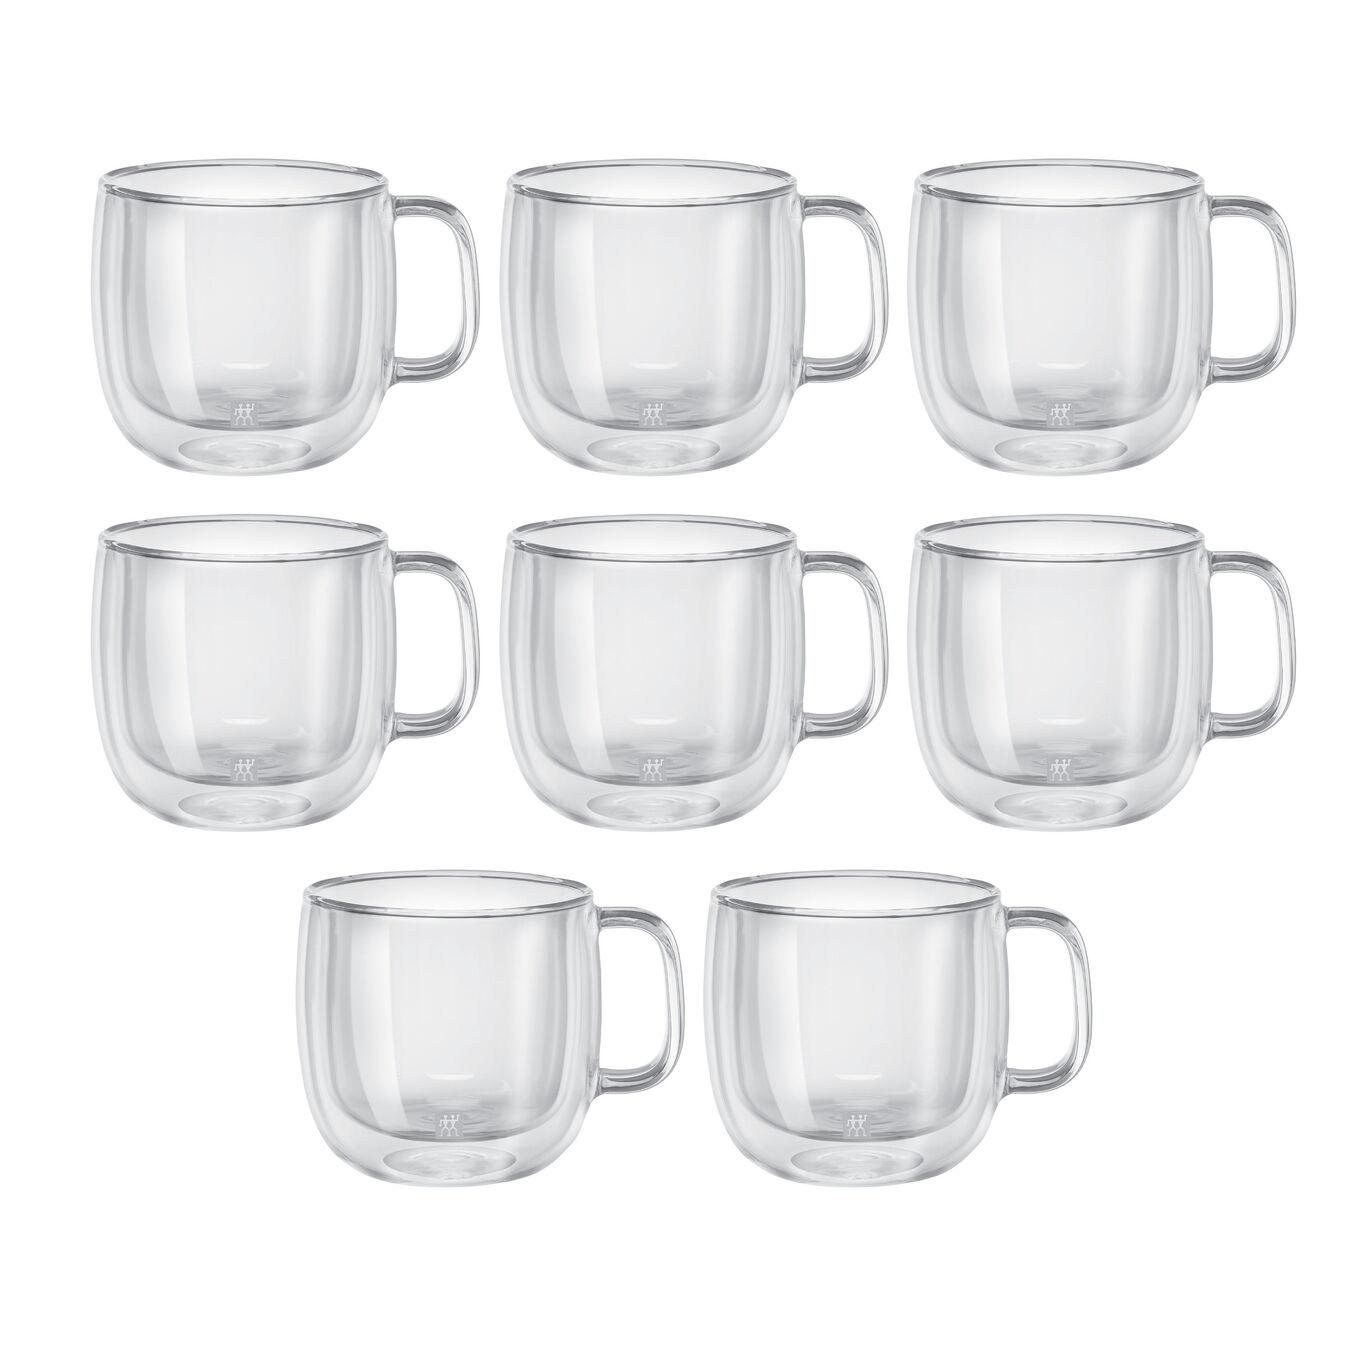 8 Piece Cappuccino Mug Set - Value Pack,,large 1